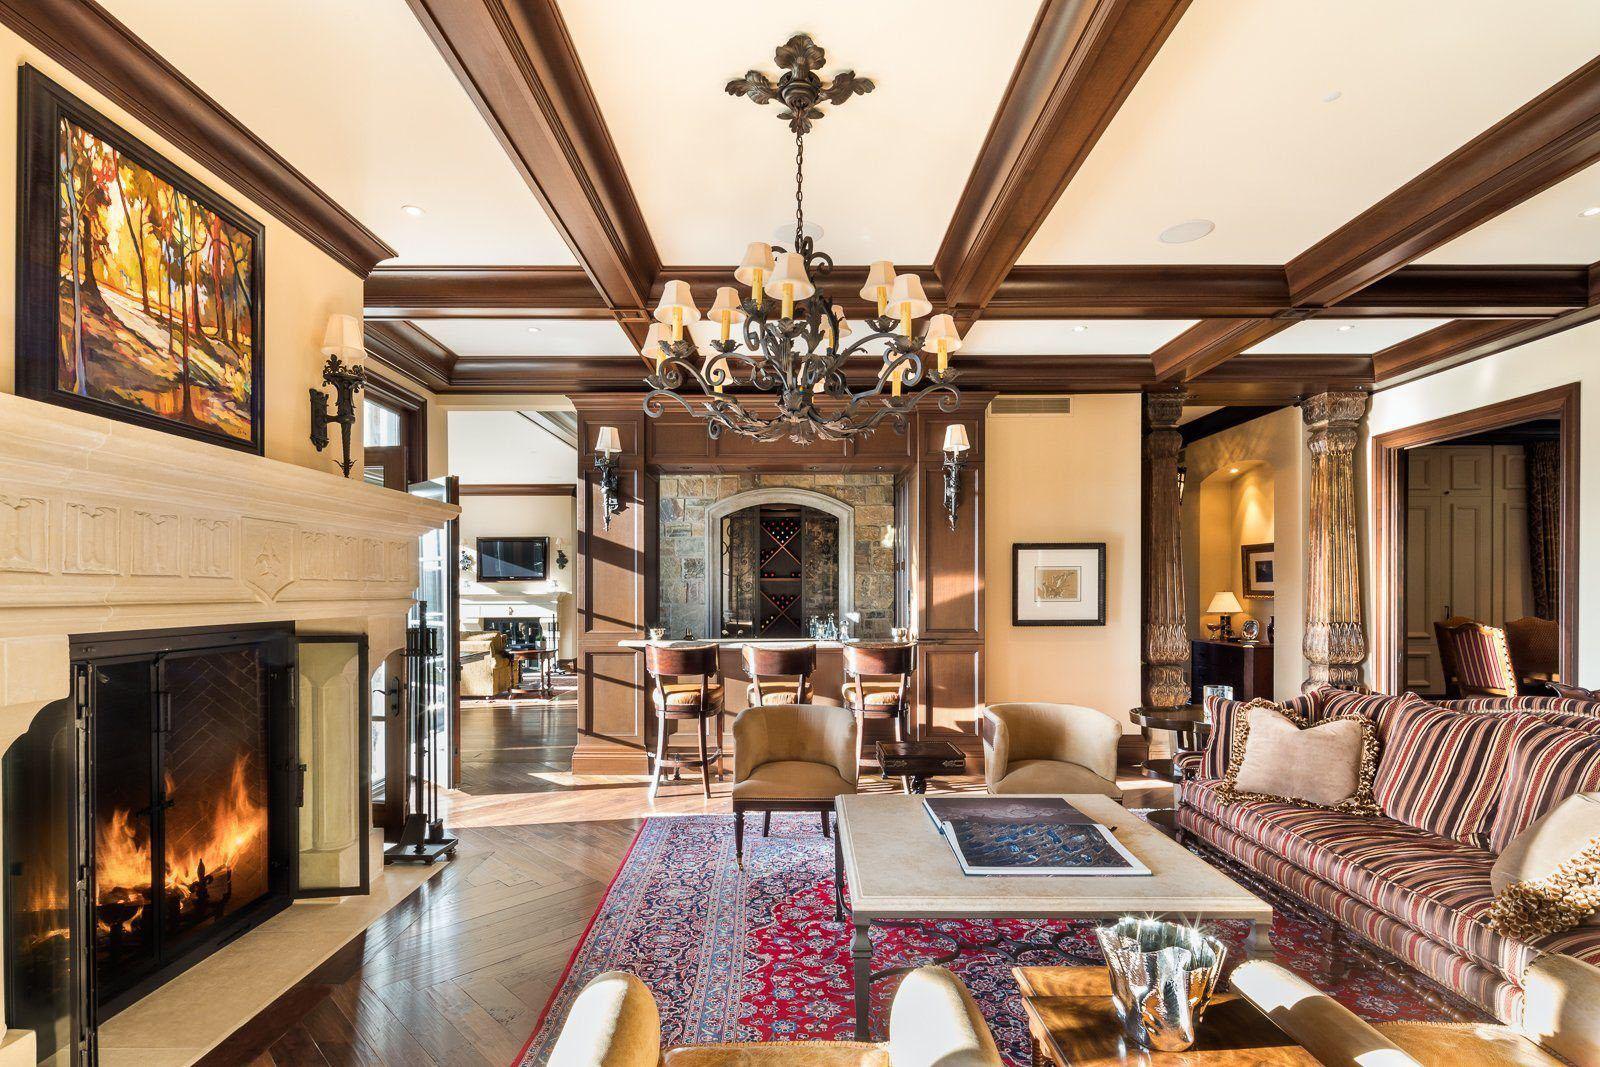 beautiful pattern silk rug in a rustic living room